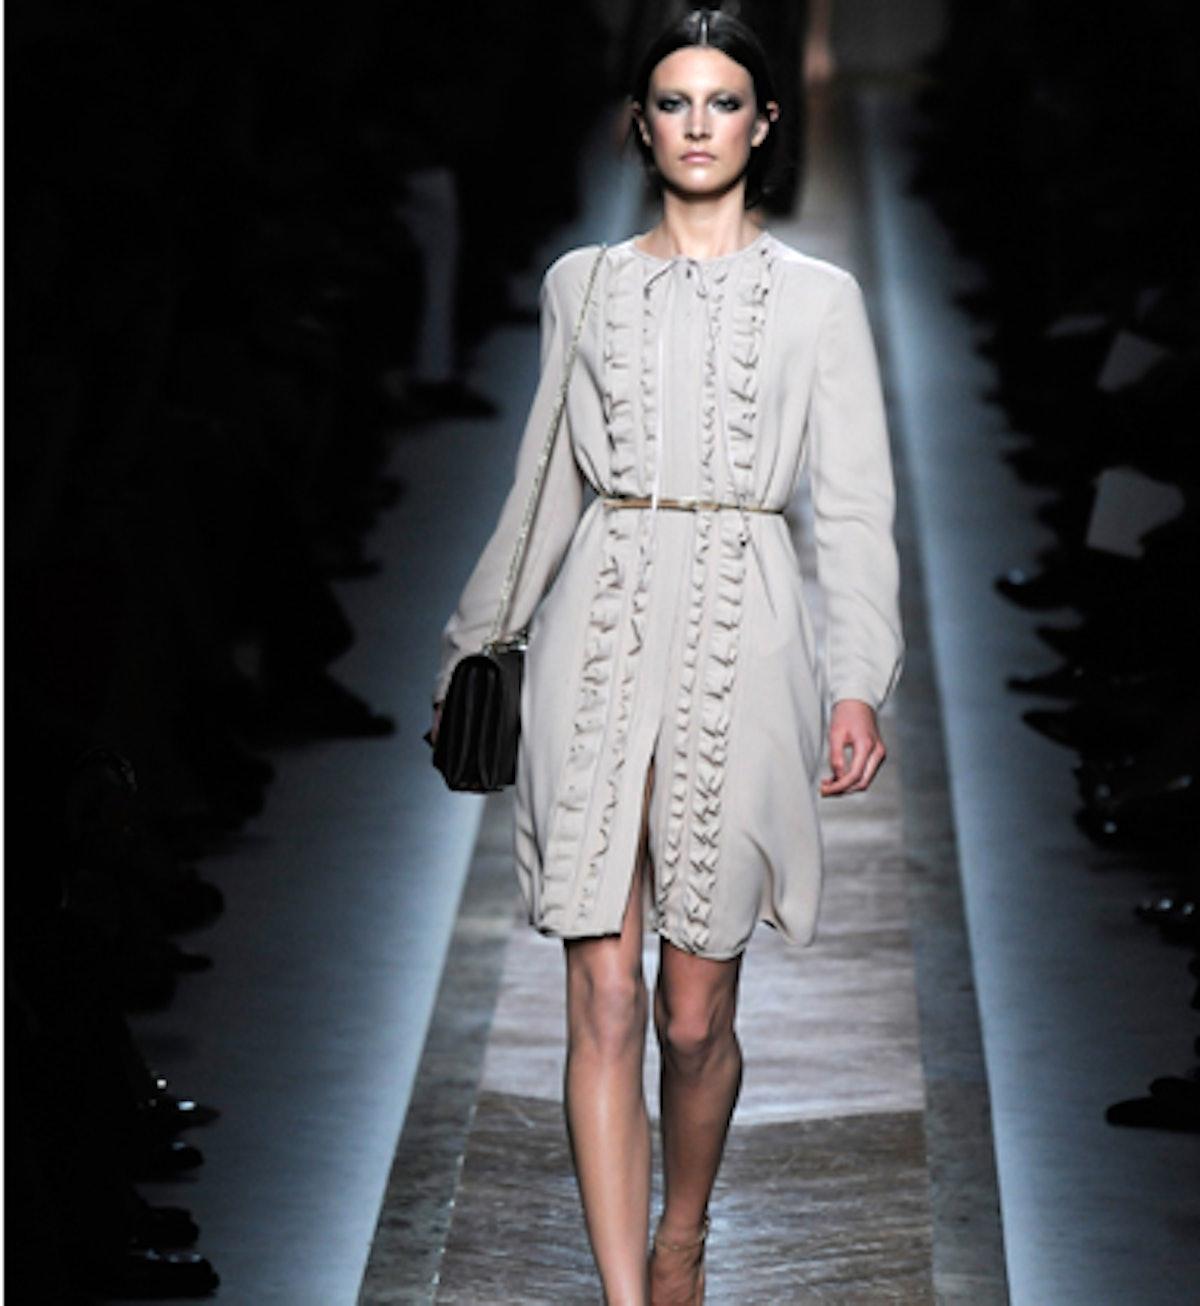 blog-this-weeks-model-jacquelyn-jablonski-04.jpg